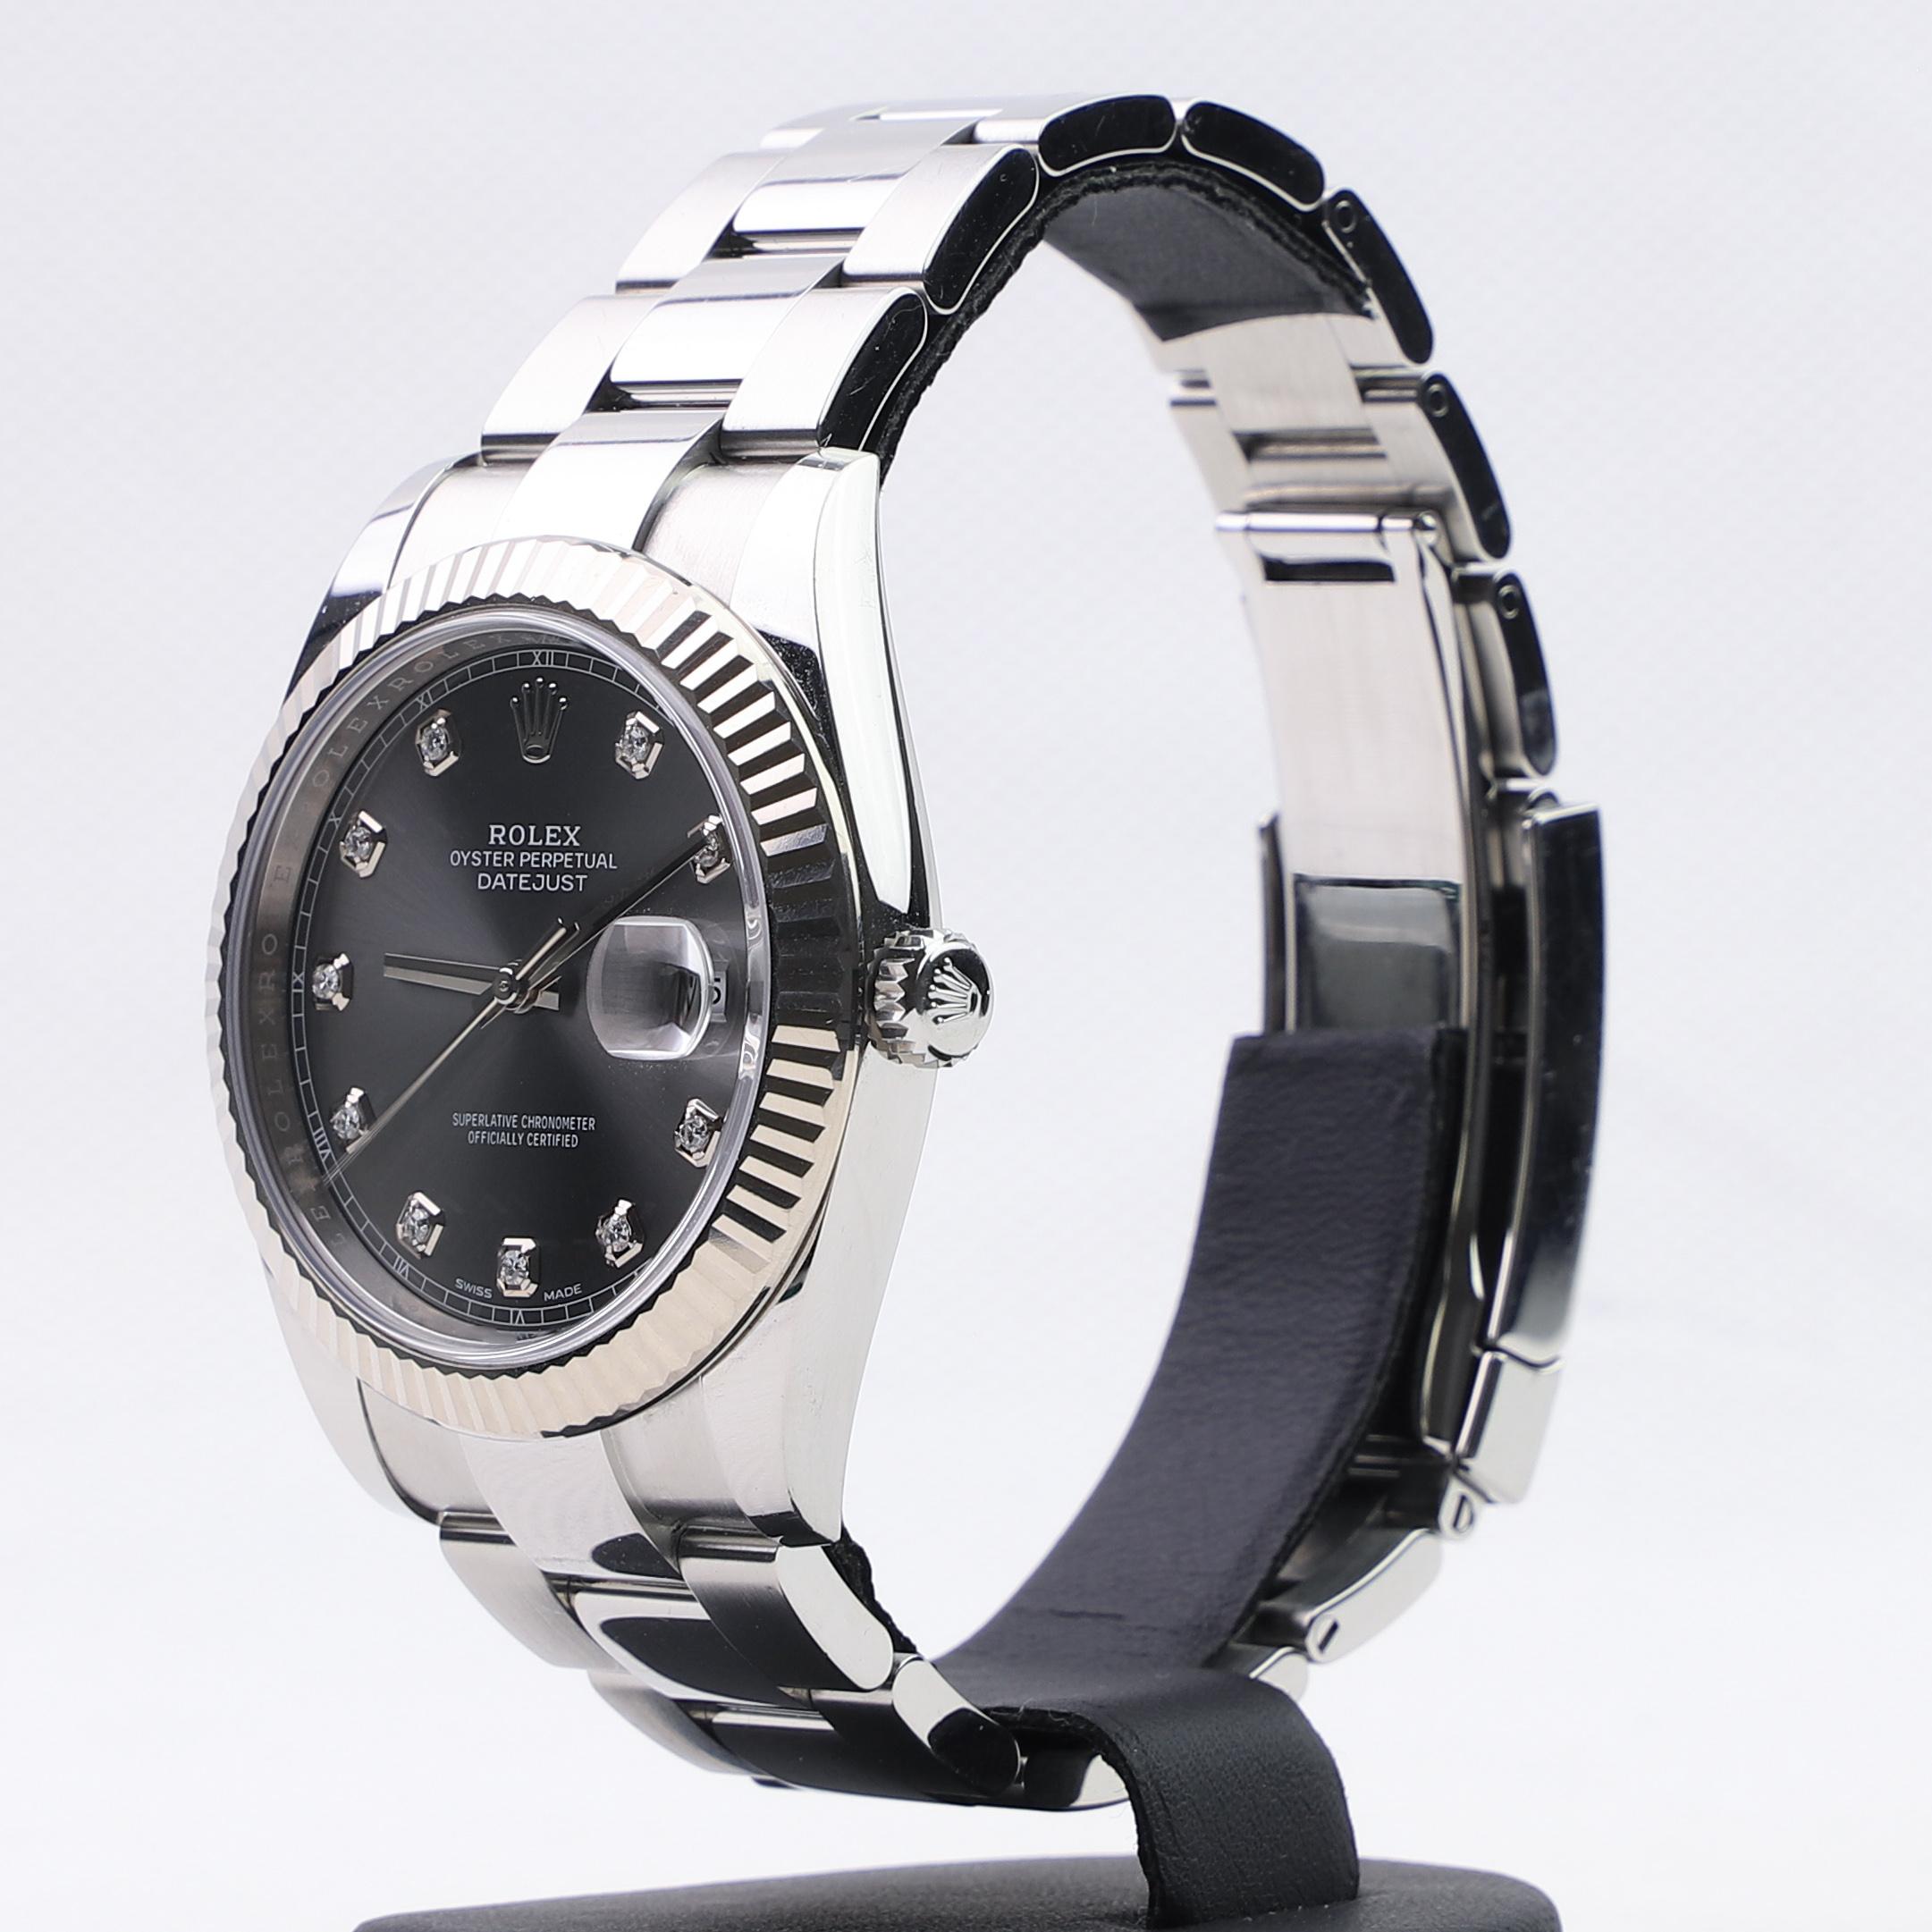 Rolex Datejust 41 Dark Rhodium Diamond Dial 126334